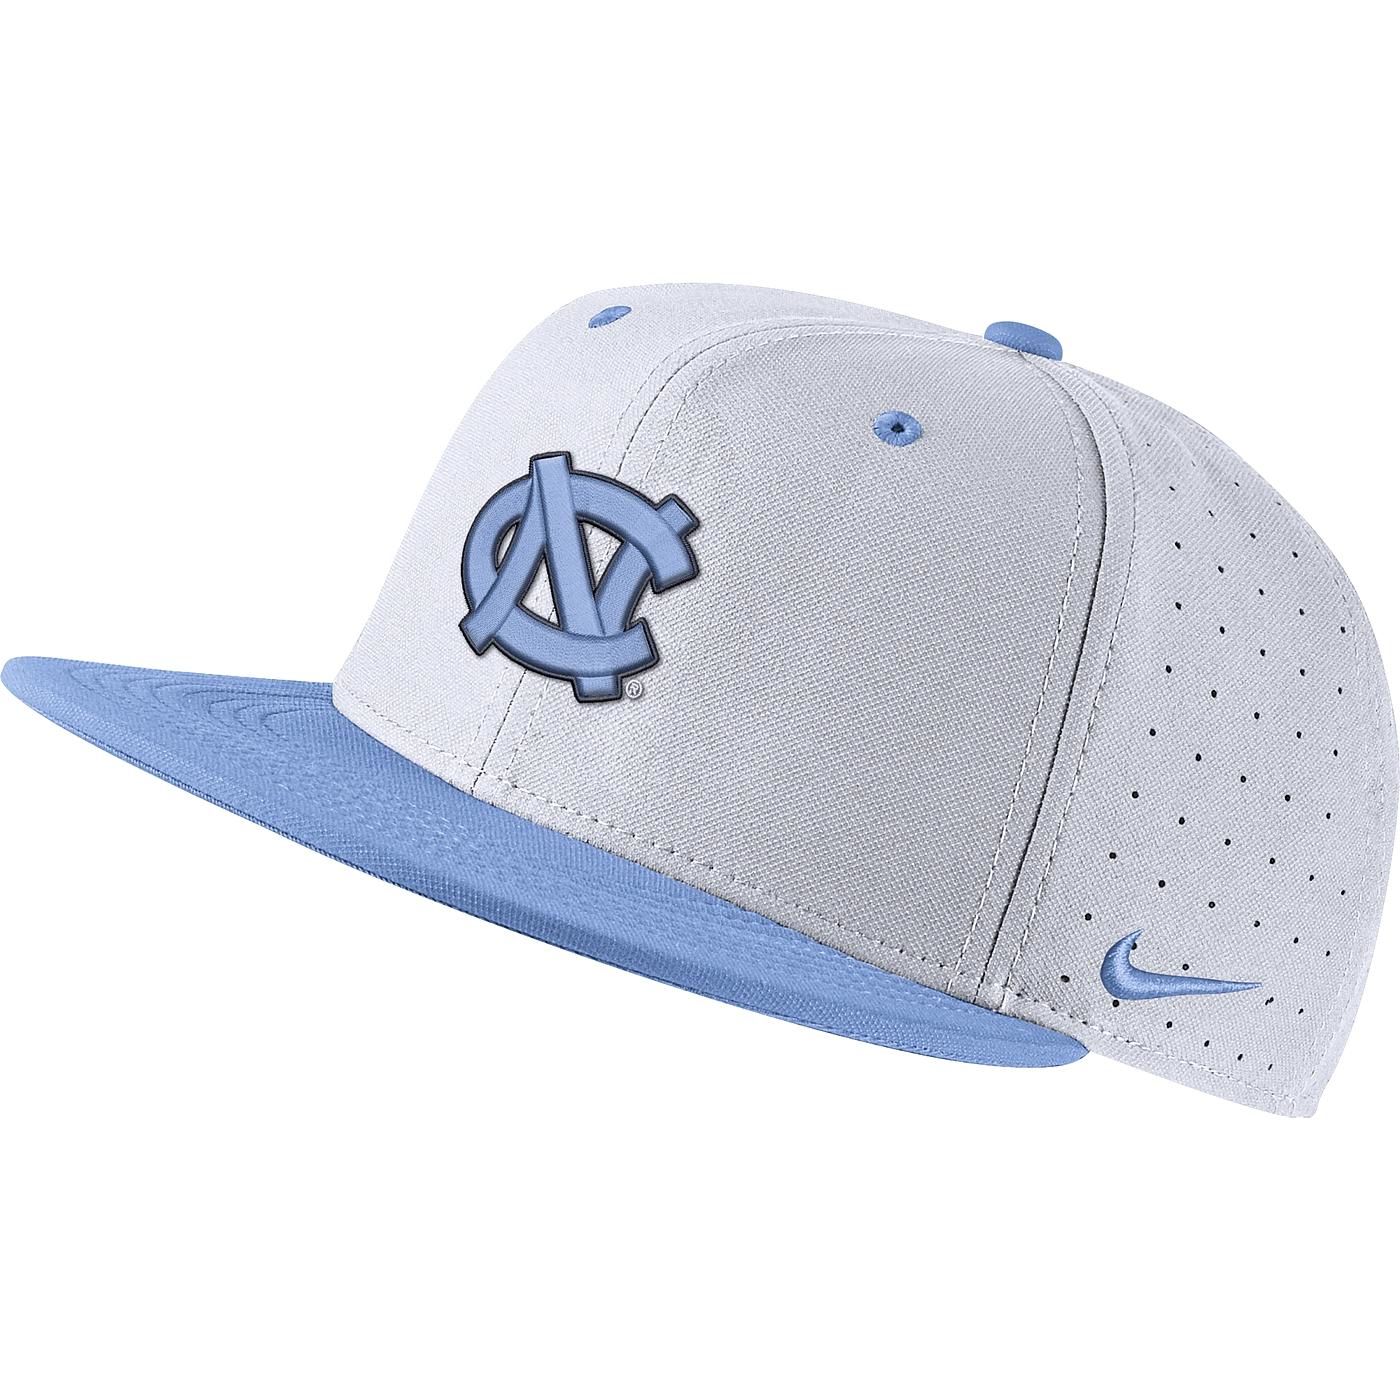 624f4b08f360c Johnny T-shirt - North Carolina Tar Heels - Nike Aerobill True Baseball  Fitted Hat (White CB) by Nike